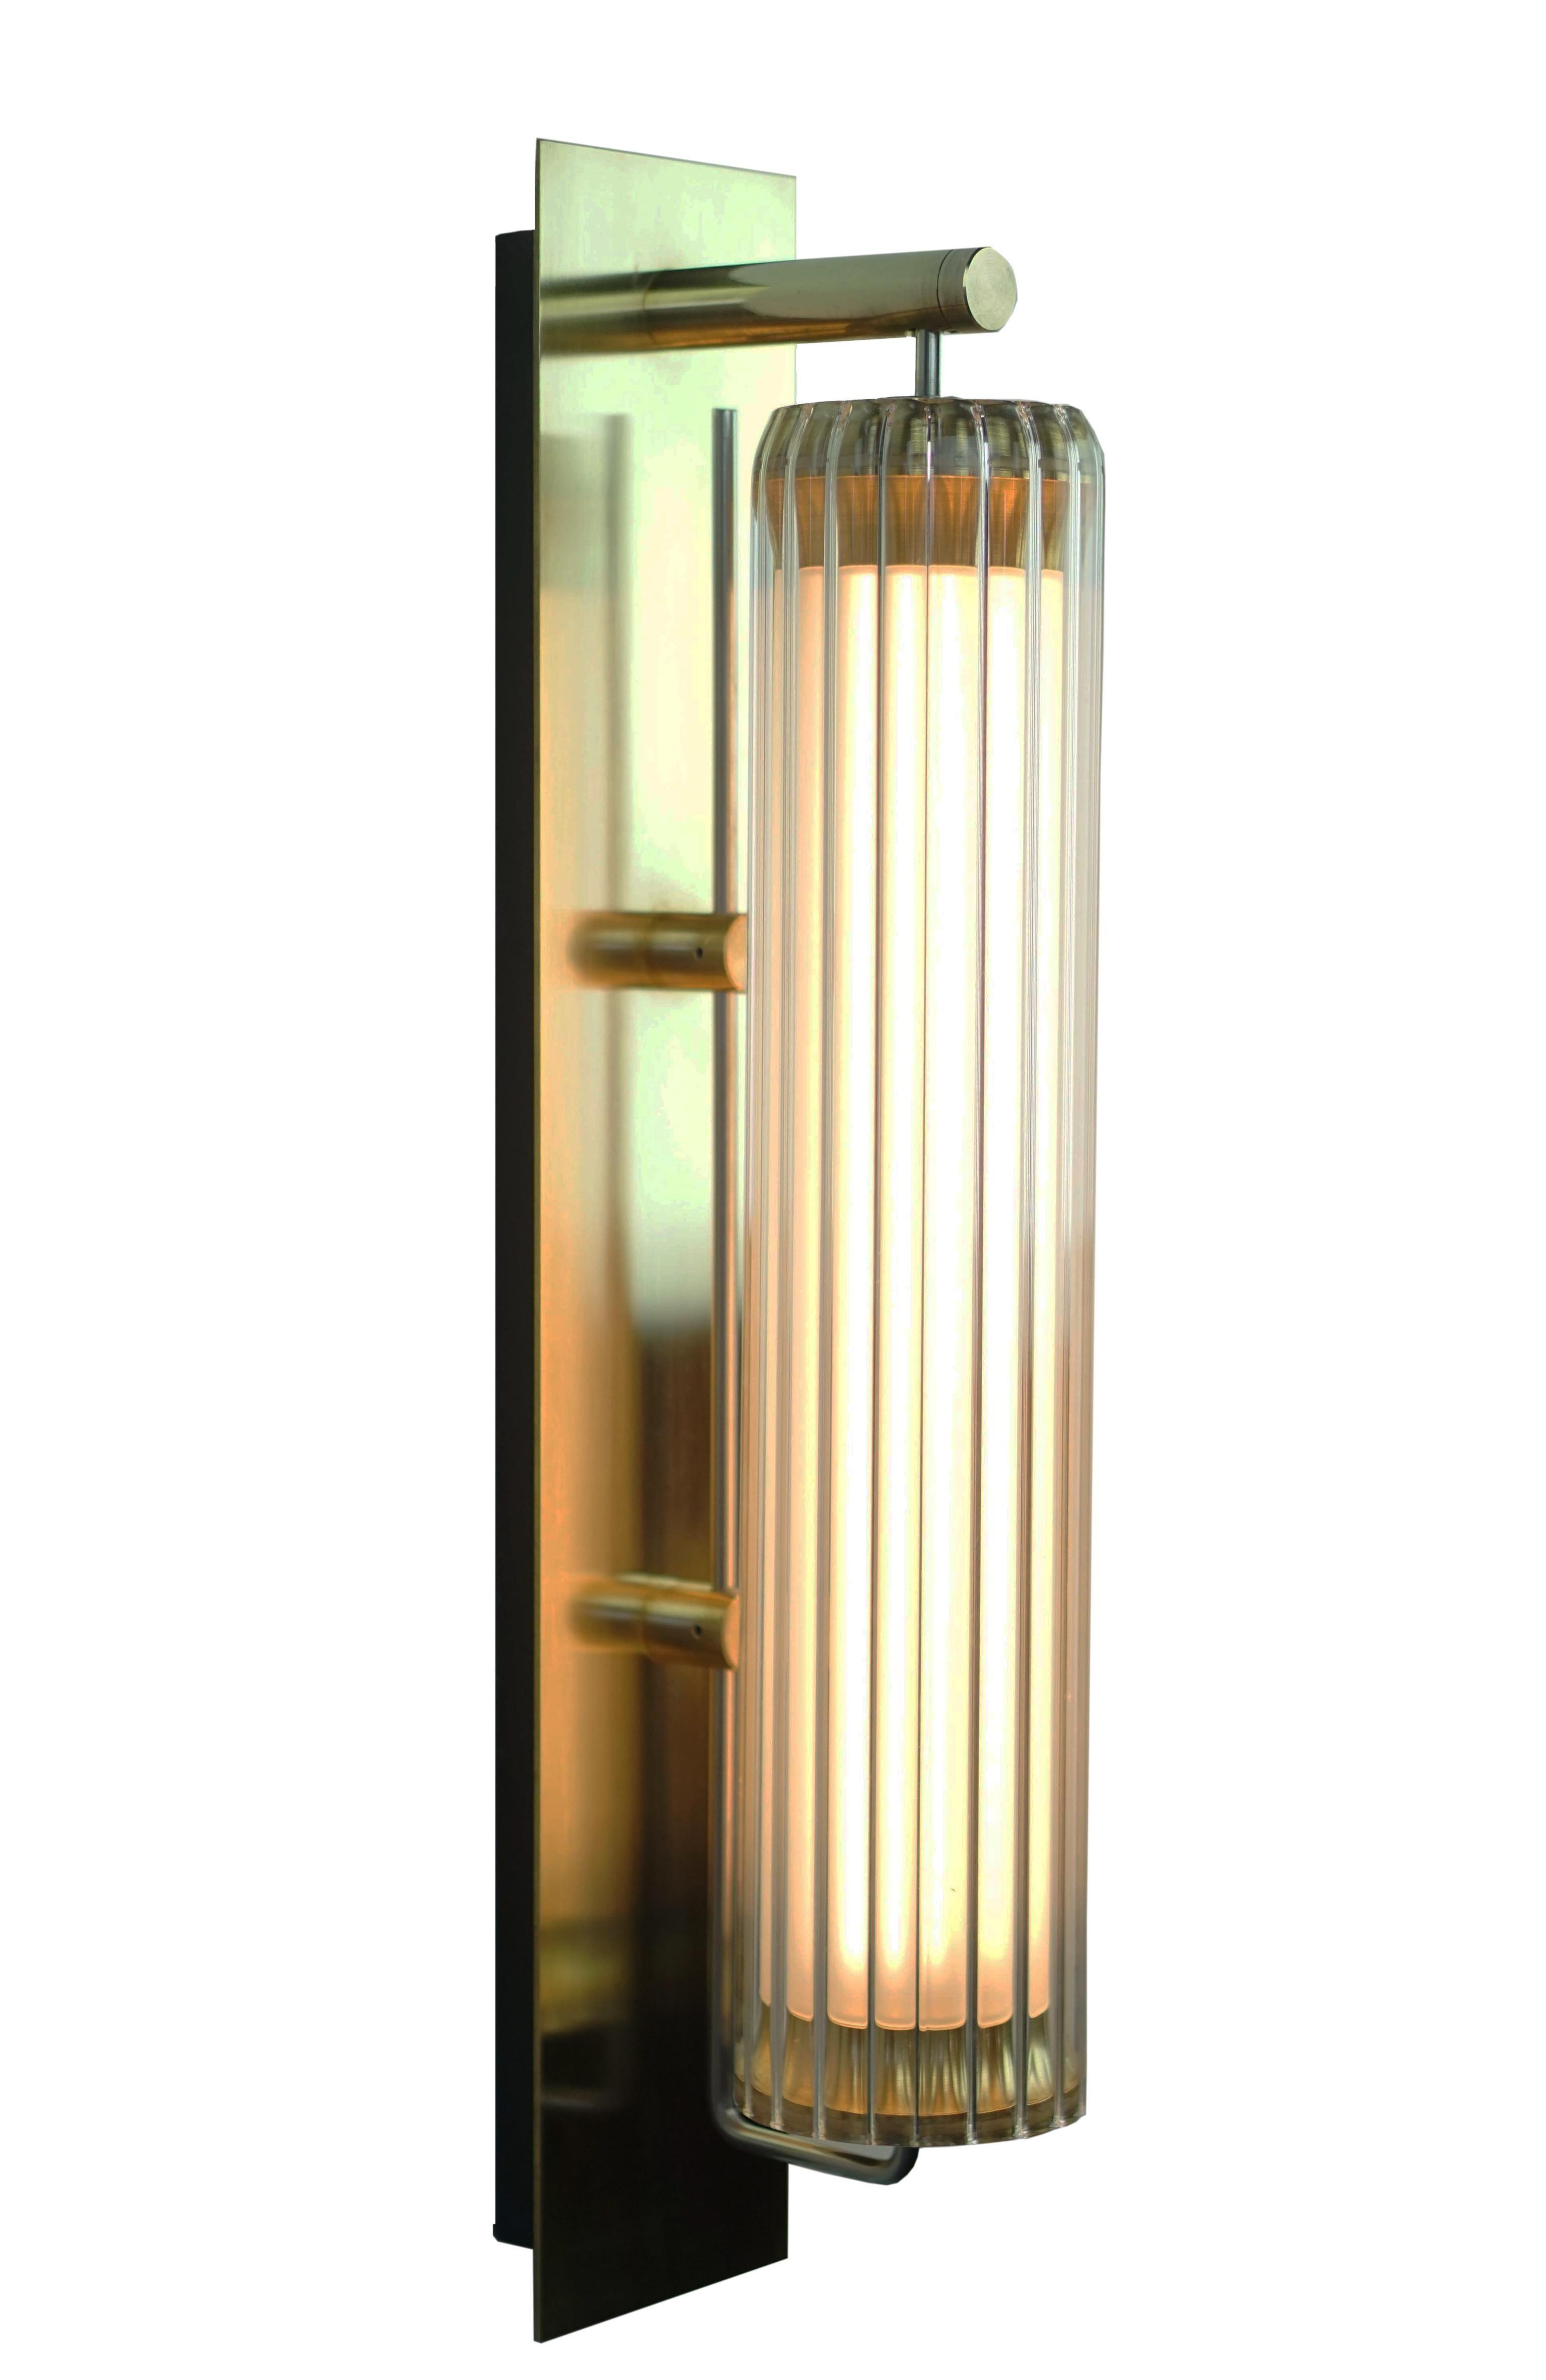 Jonathan Coles Lighting Fresnel Wall Light Wall Lights Indoor Wall Lights Light